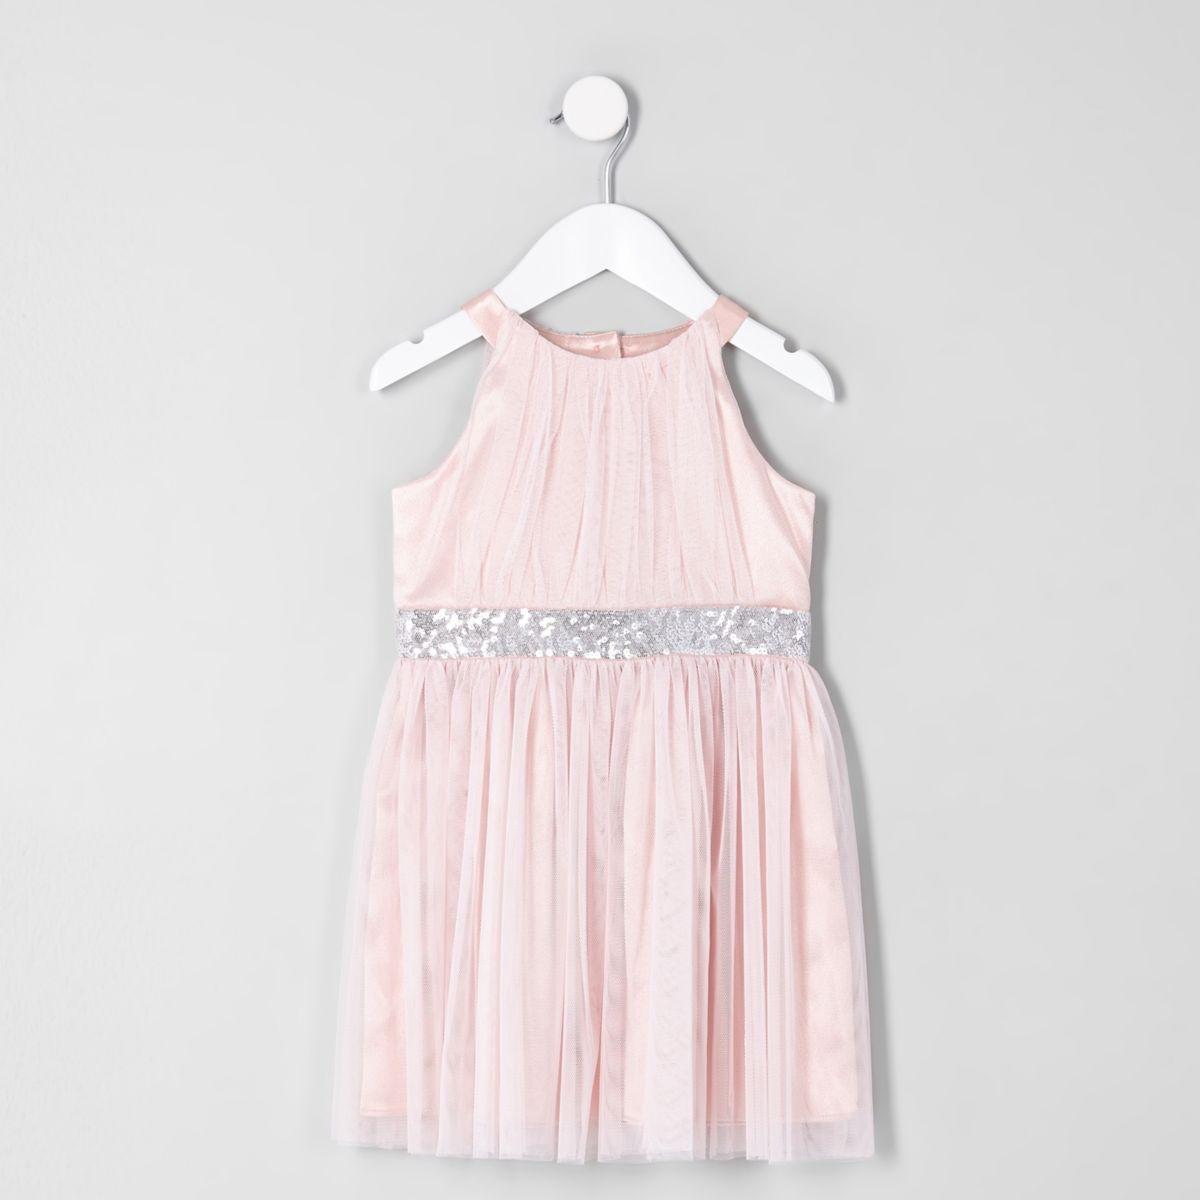 Vente Populaire Prix Le Plus Bas River Island Robe de gala trapèze en tulle mini fille zgb8n